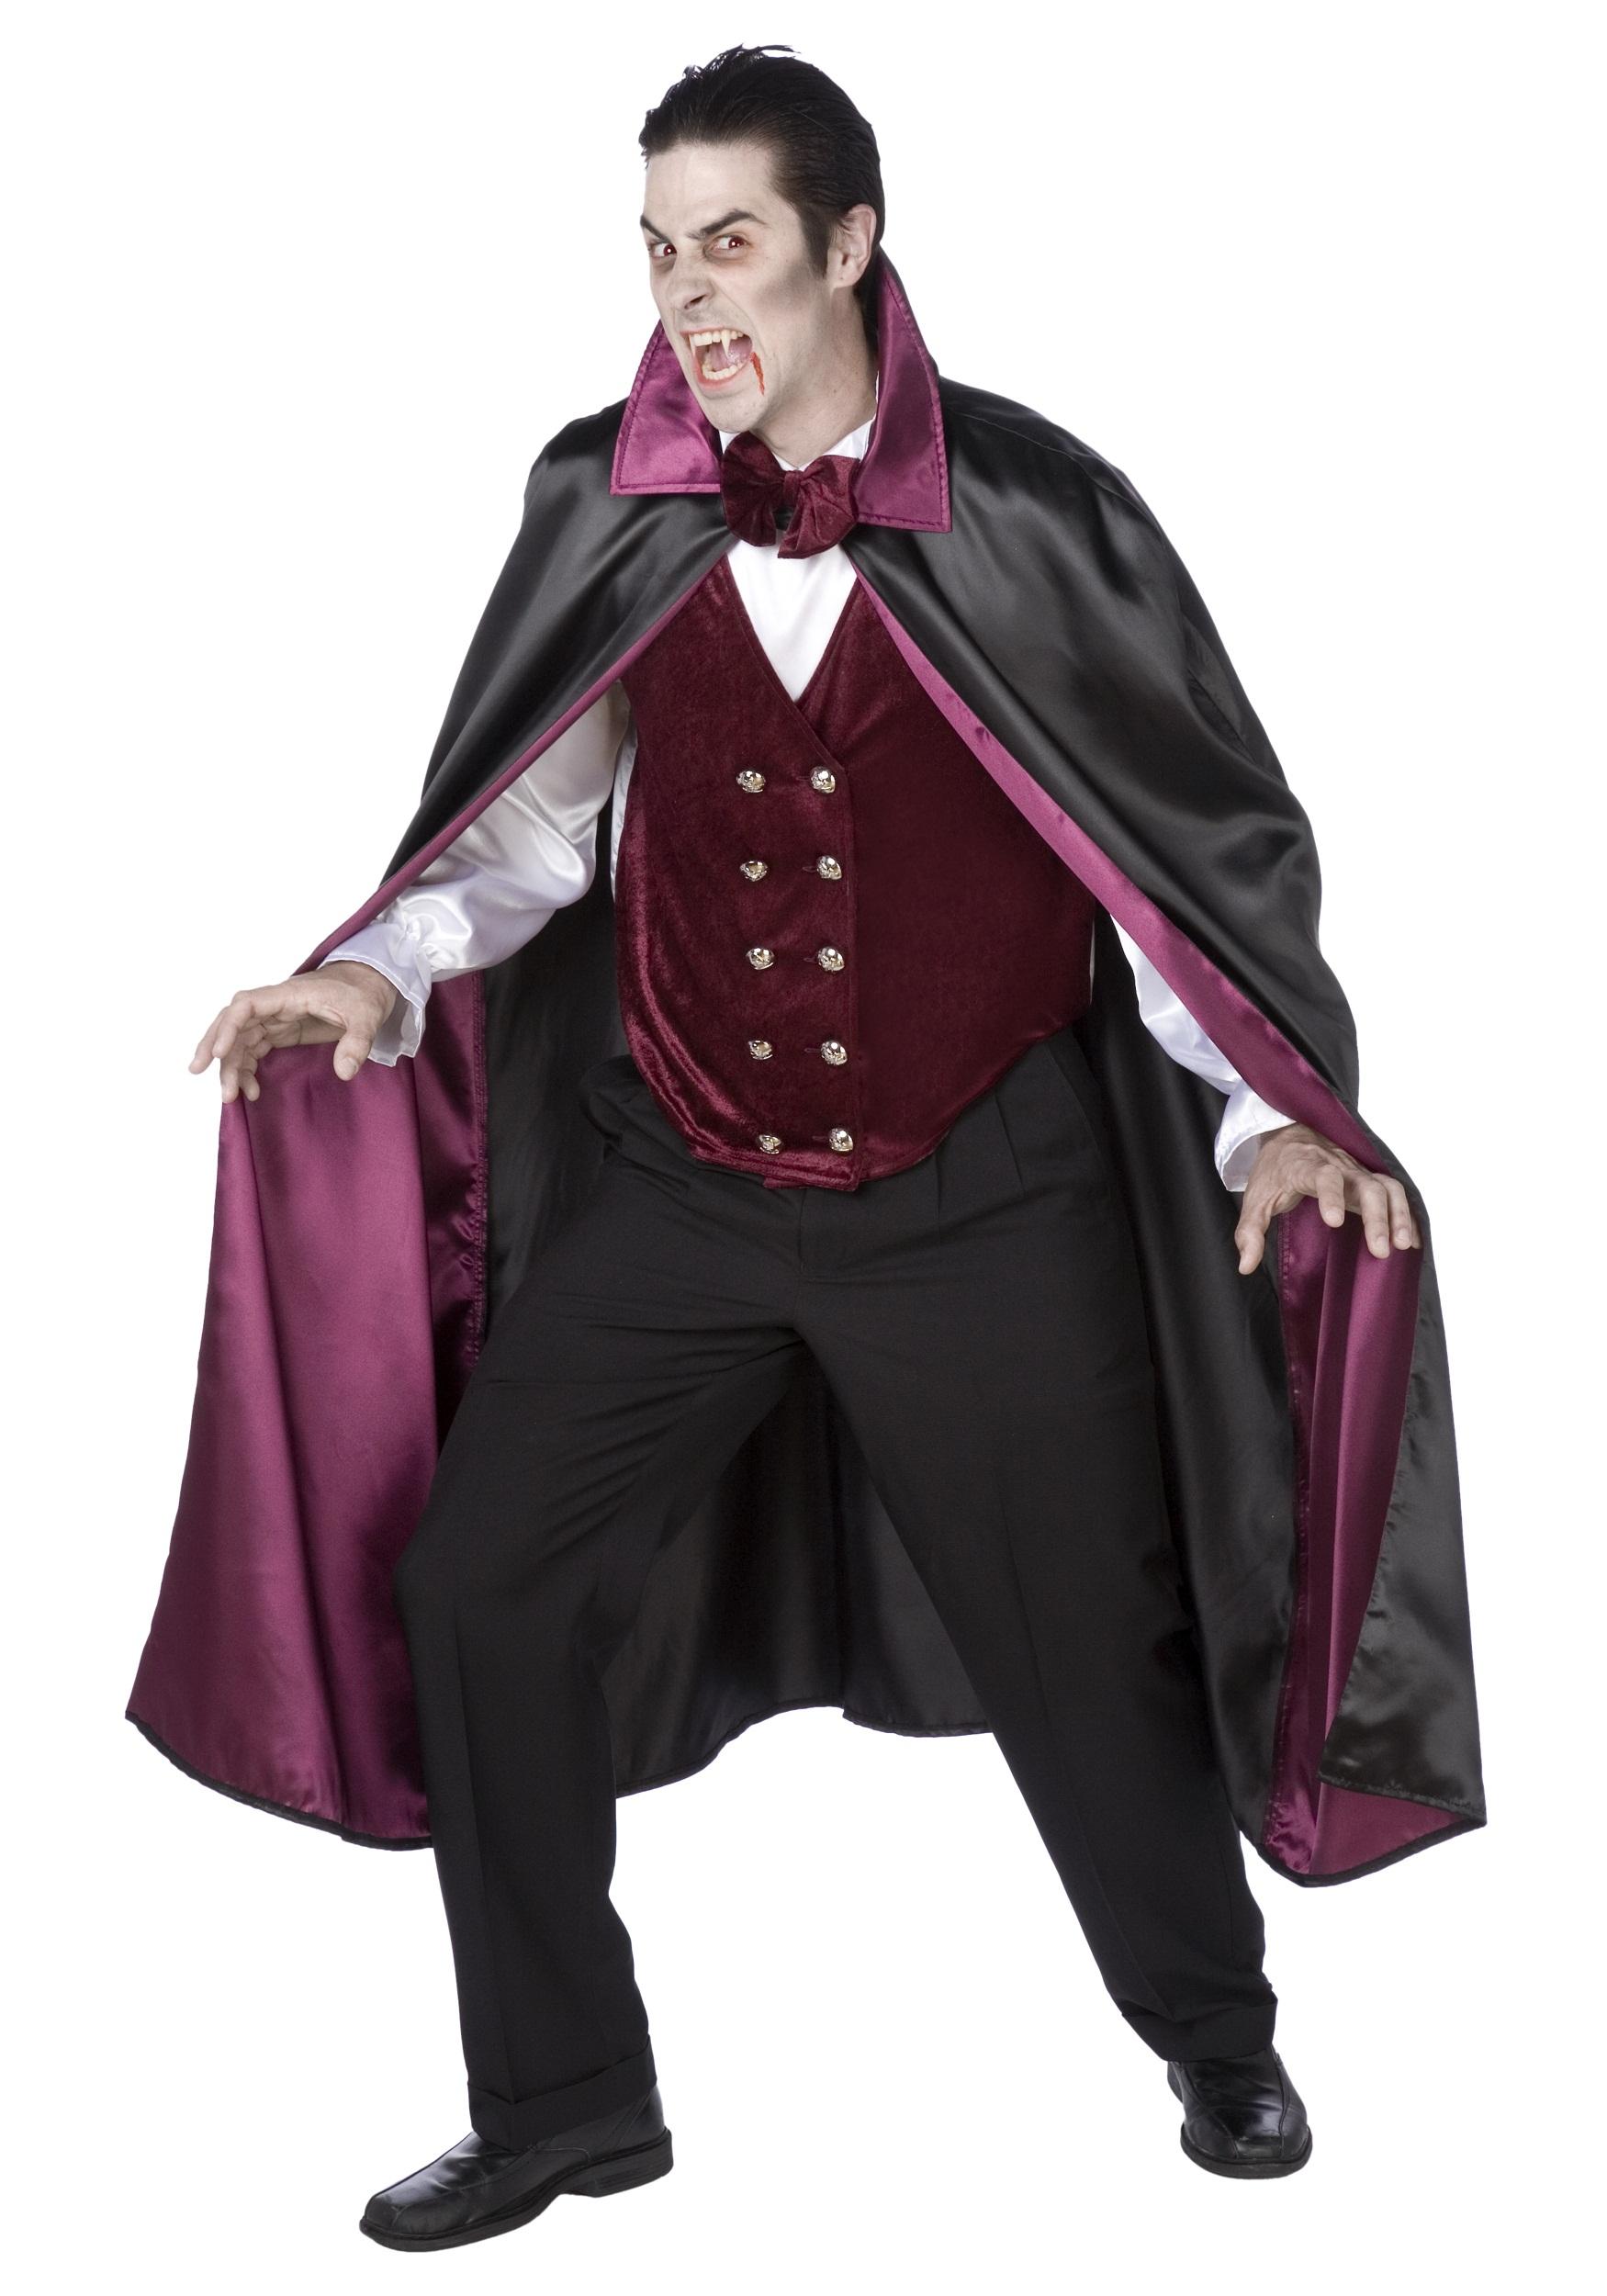 Mens Deluxe V&ire Costume  sc 1 st  Halloween Costumes & Mens Deluxe Vampire Costume - Halloween Costumes